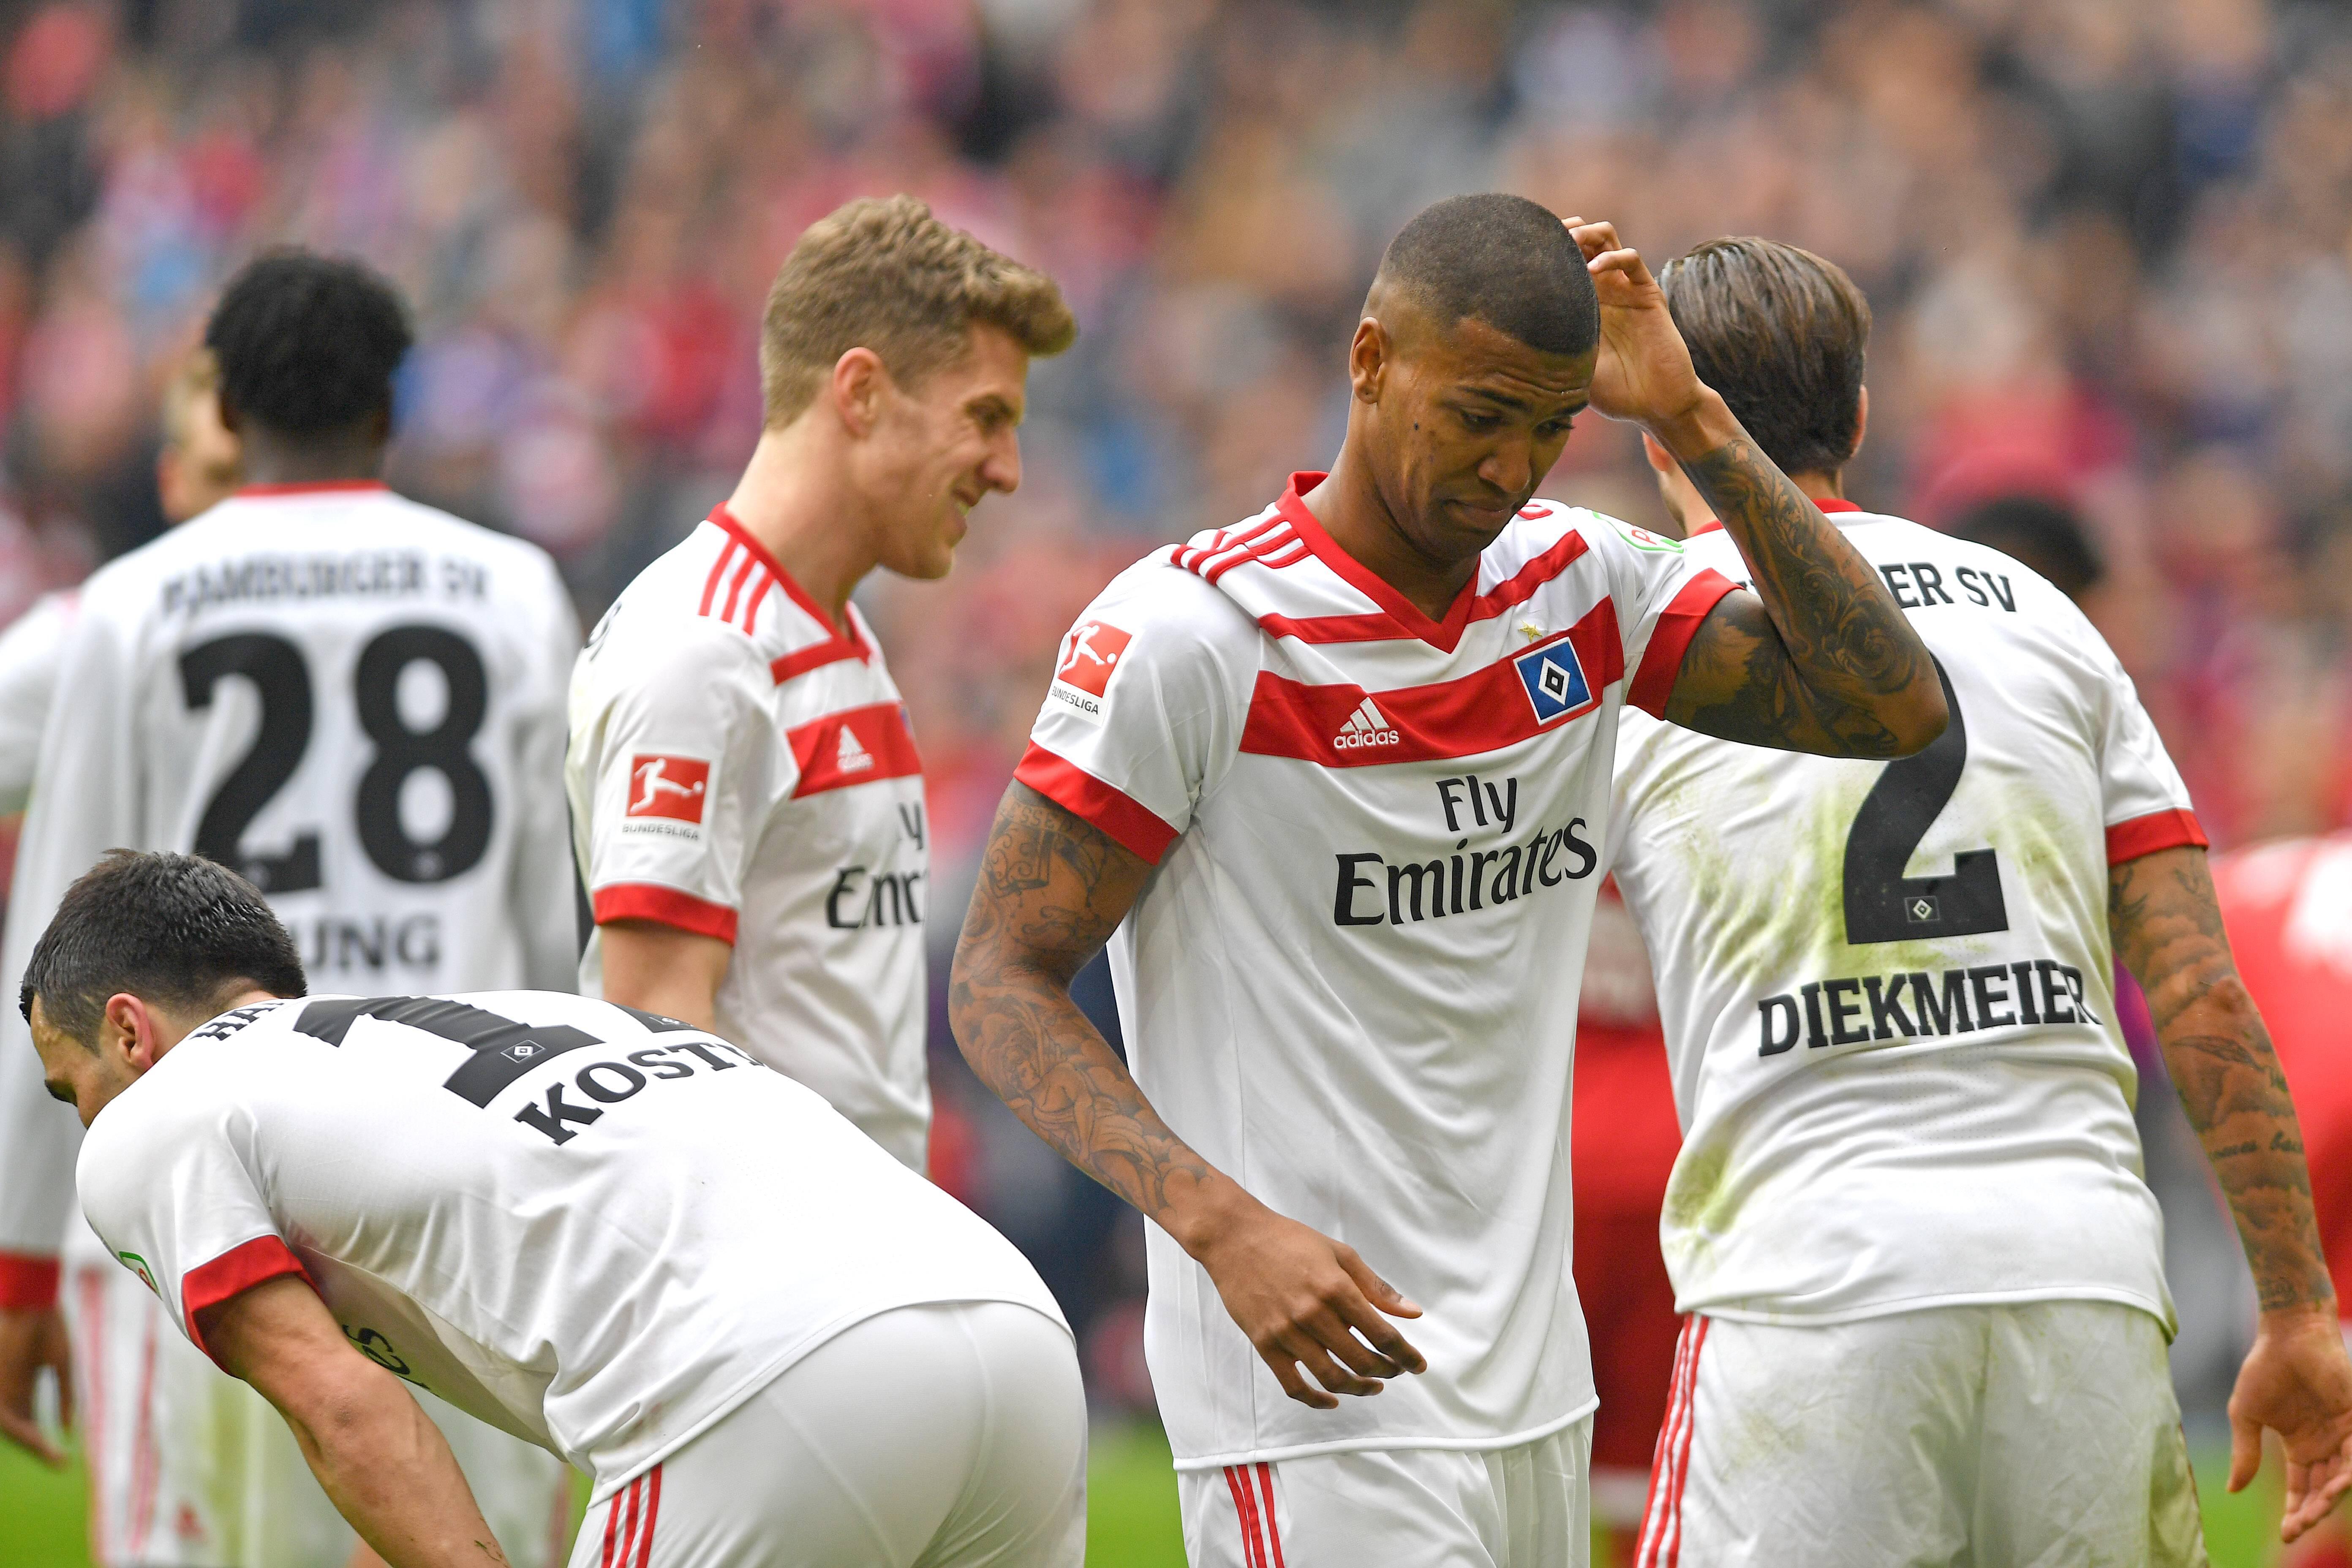 Bild zu HSV, Hamburger SV, Bundesliga, Hollerbach, Bernd Hollerbach